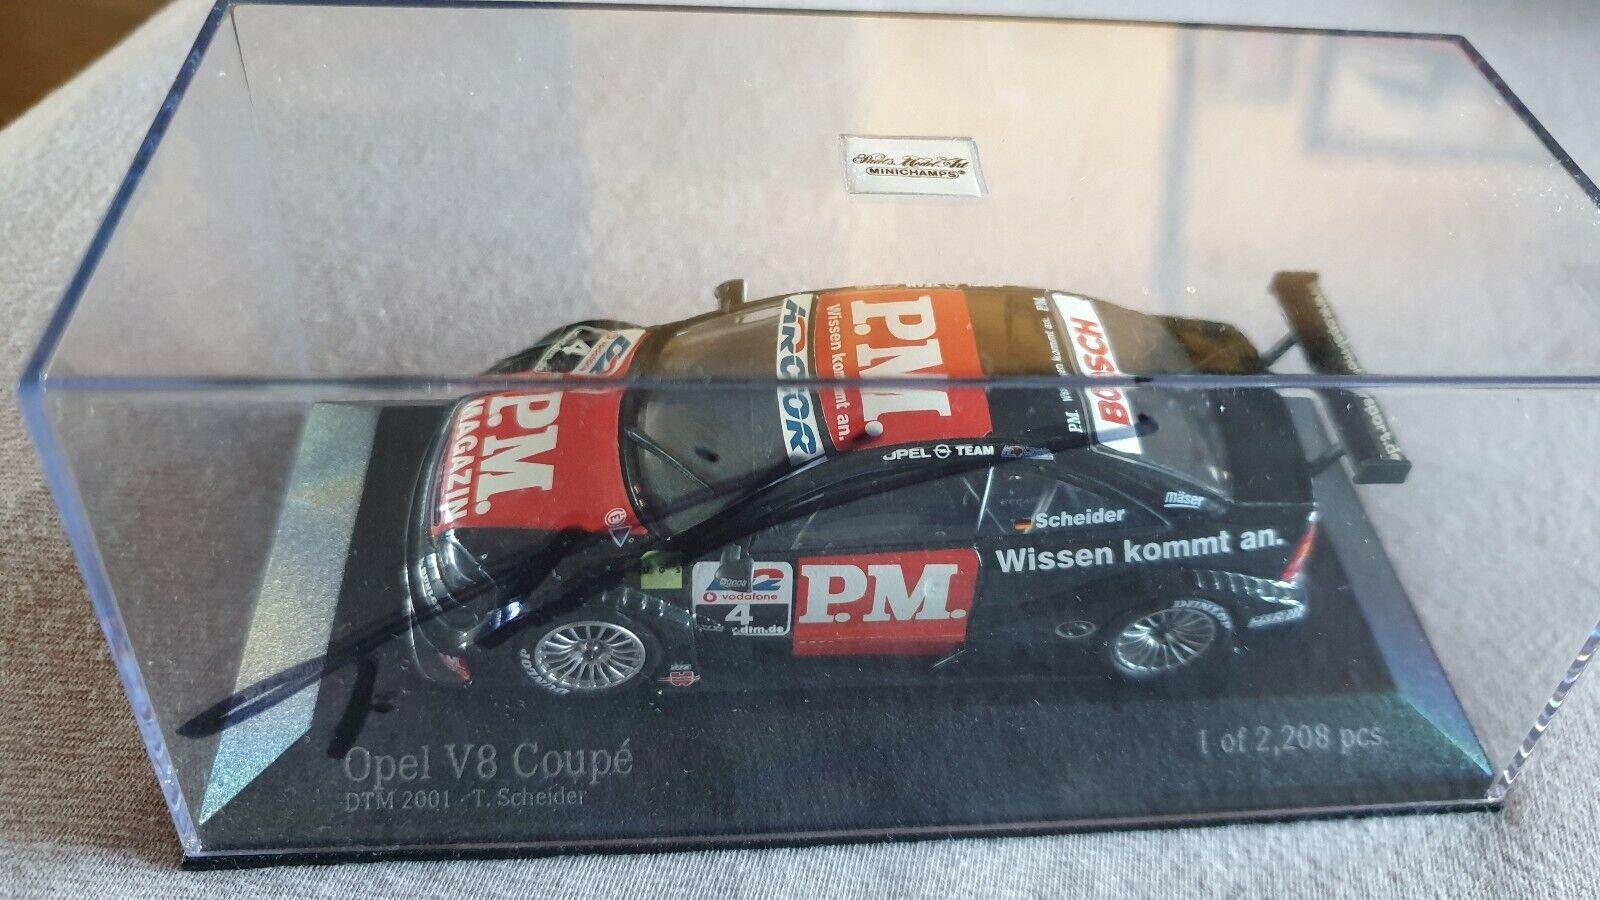 Opel V8 Coupe DTM 2001 Nr.4 Timo Scheider Minichamps 1 43 Original Signiert